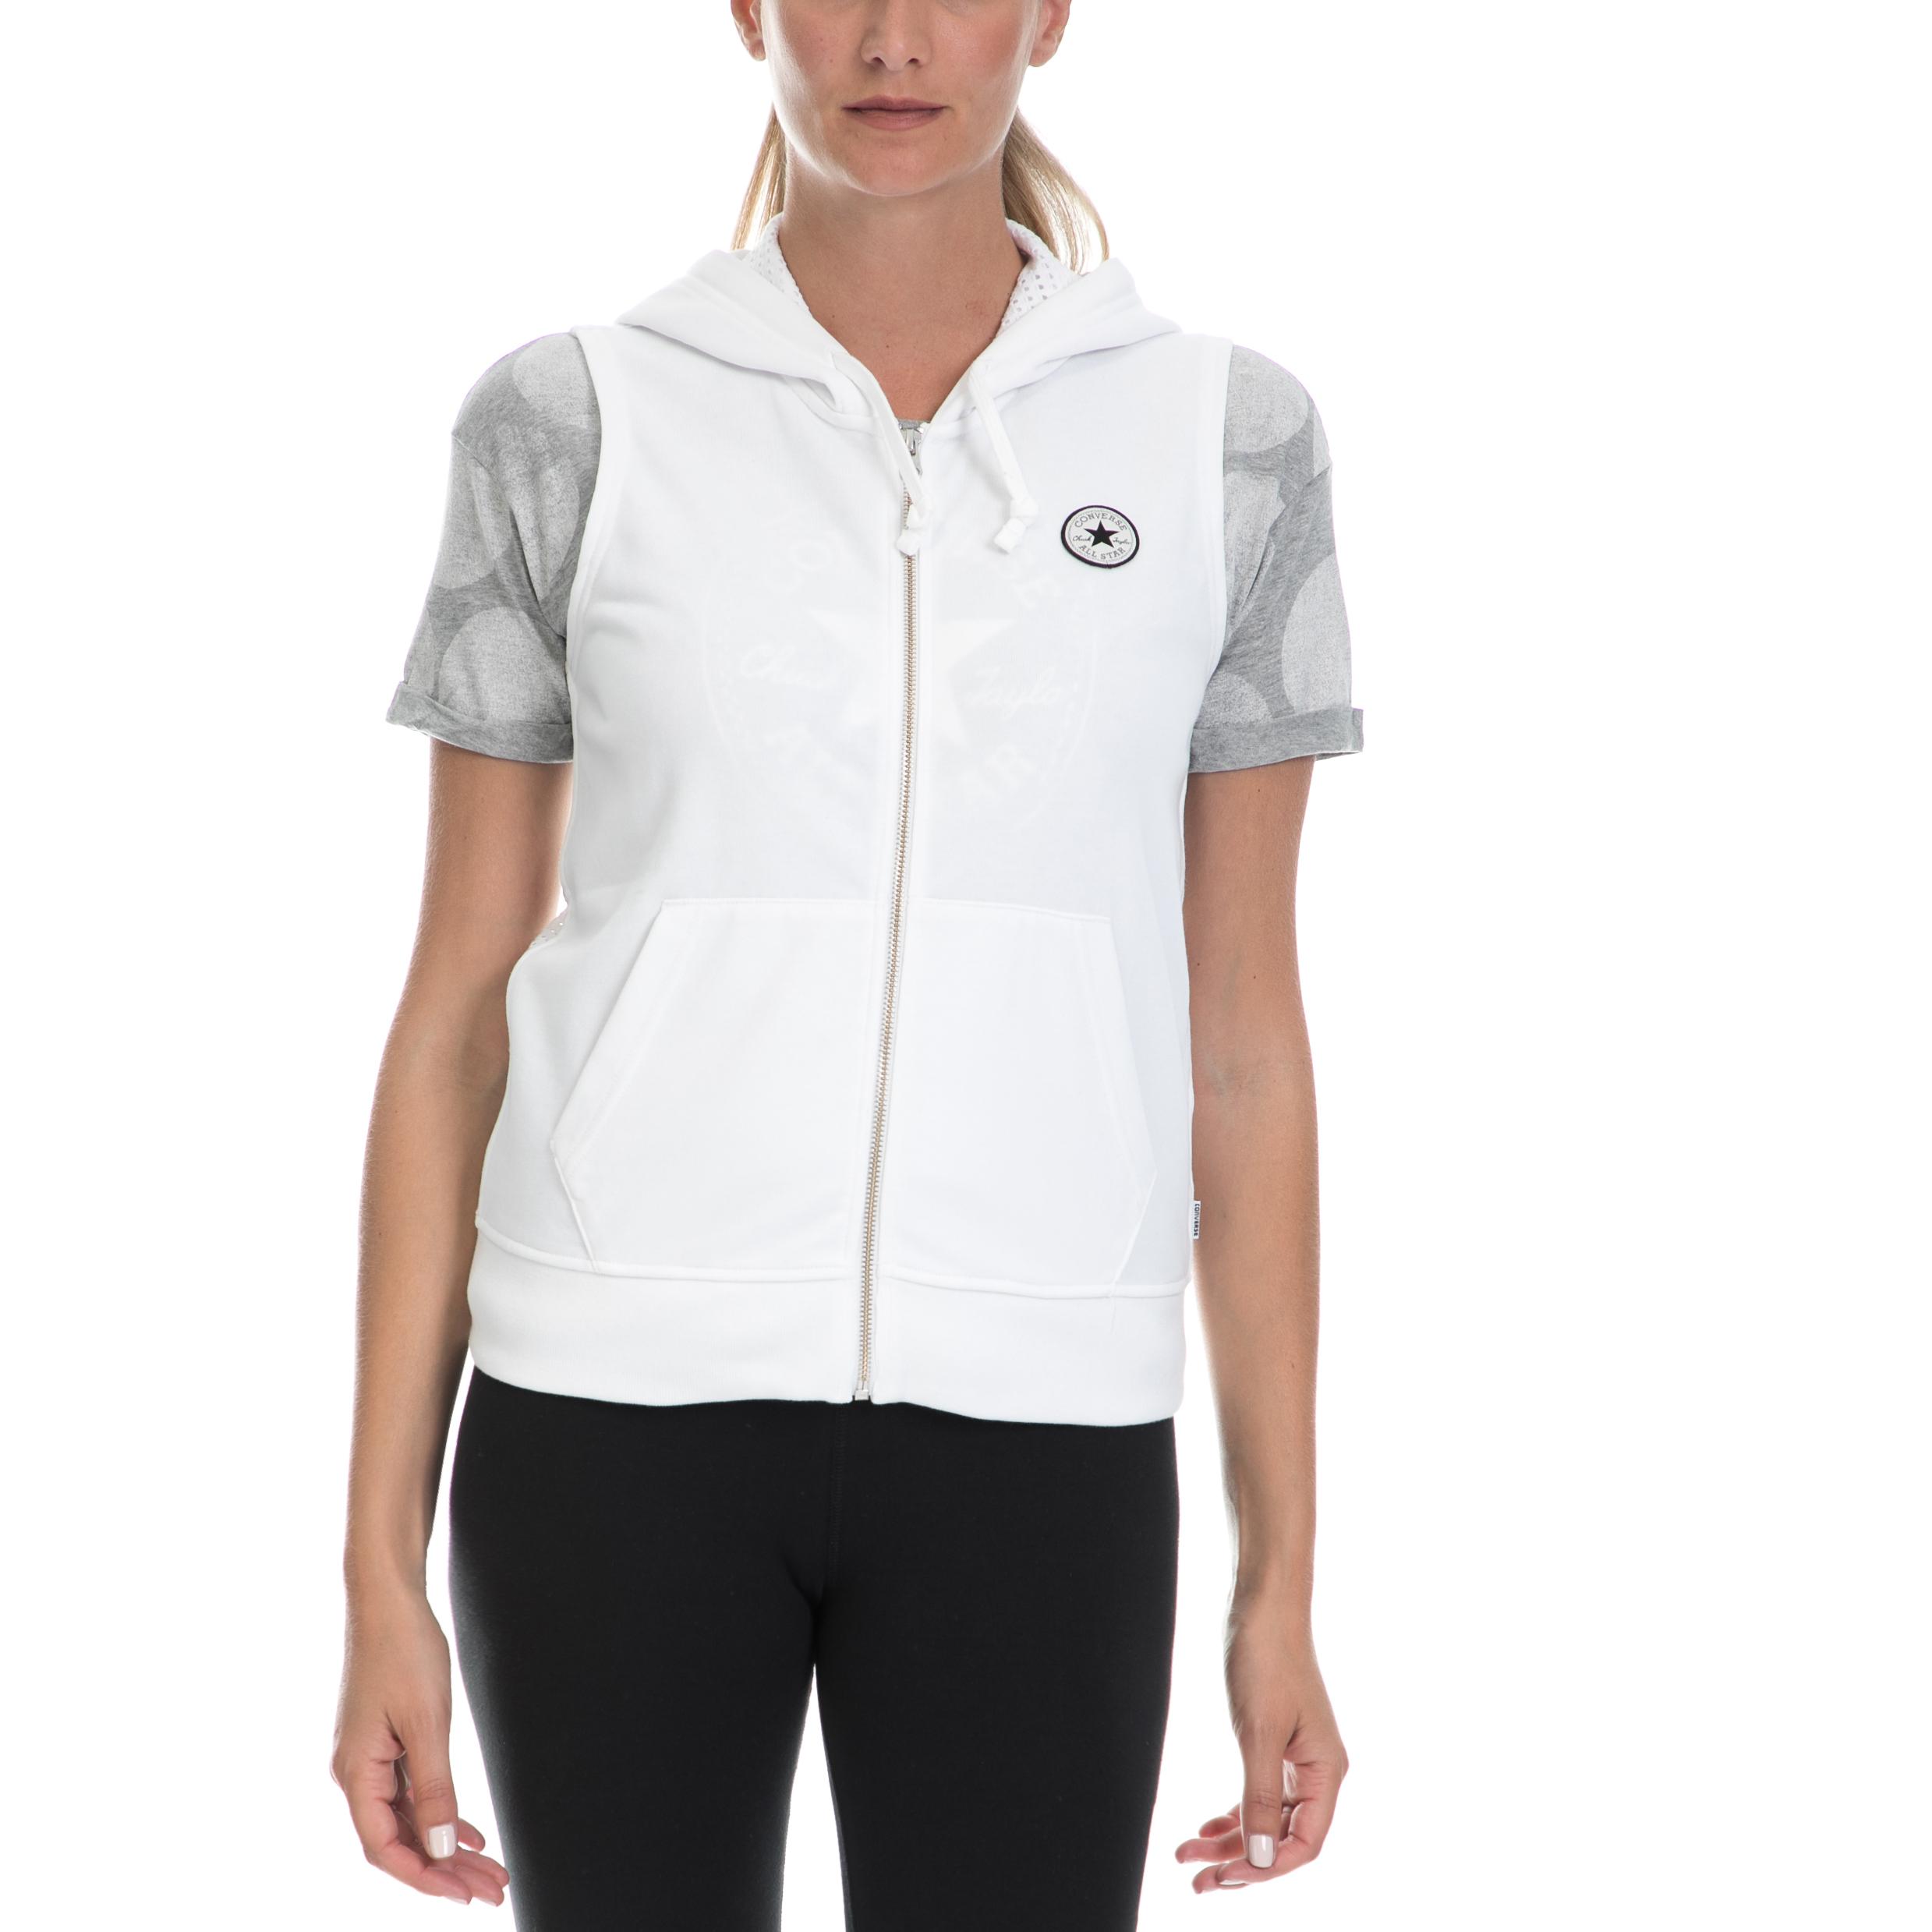 CONVERSE - Γυναικεία ζακέτα CONVERSE άσπρη γυναικεία ρούχα αθλητικά φούτερ μακρυμάνικα